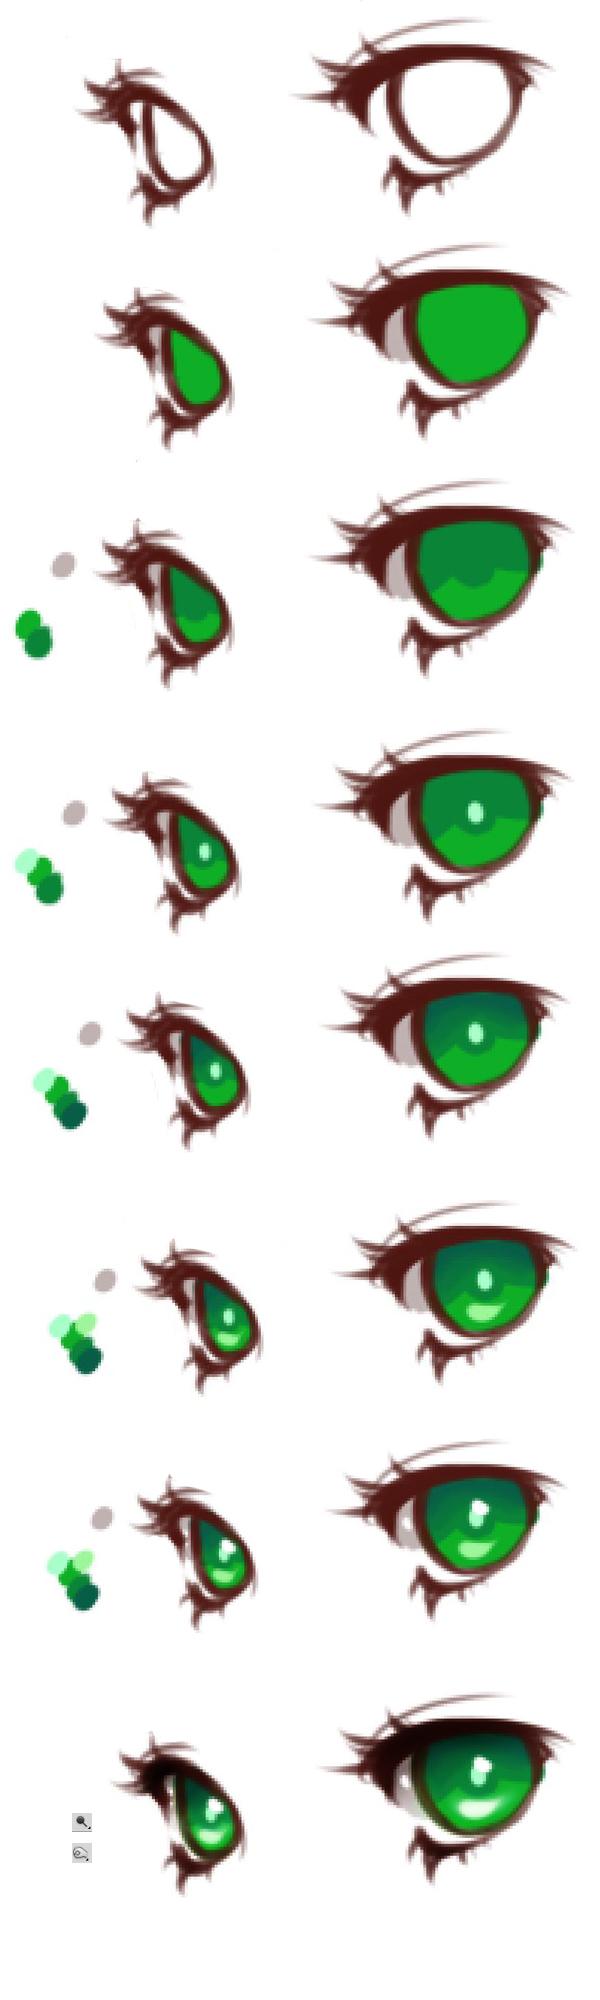 Anime Eyes Coloring Tutorial By Haloblabla Deviantart Com On